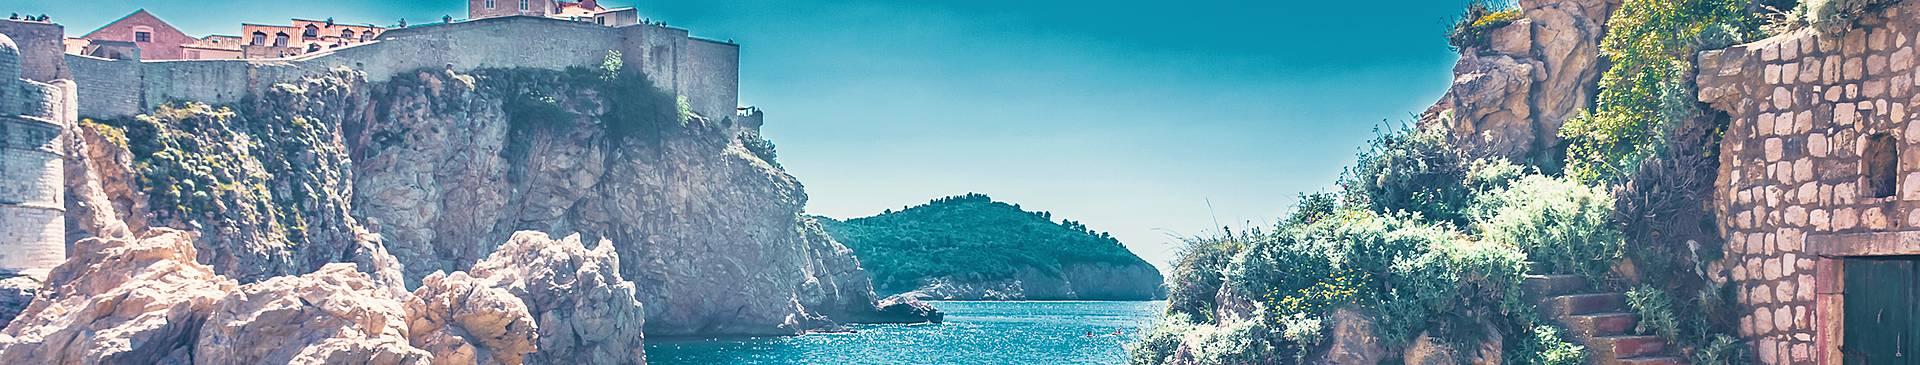 Historical sites in Croatia